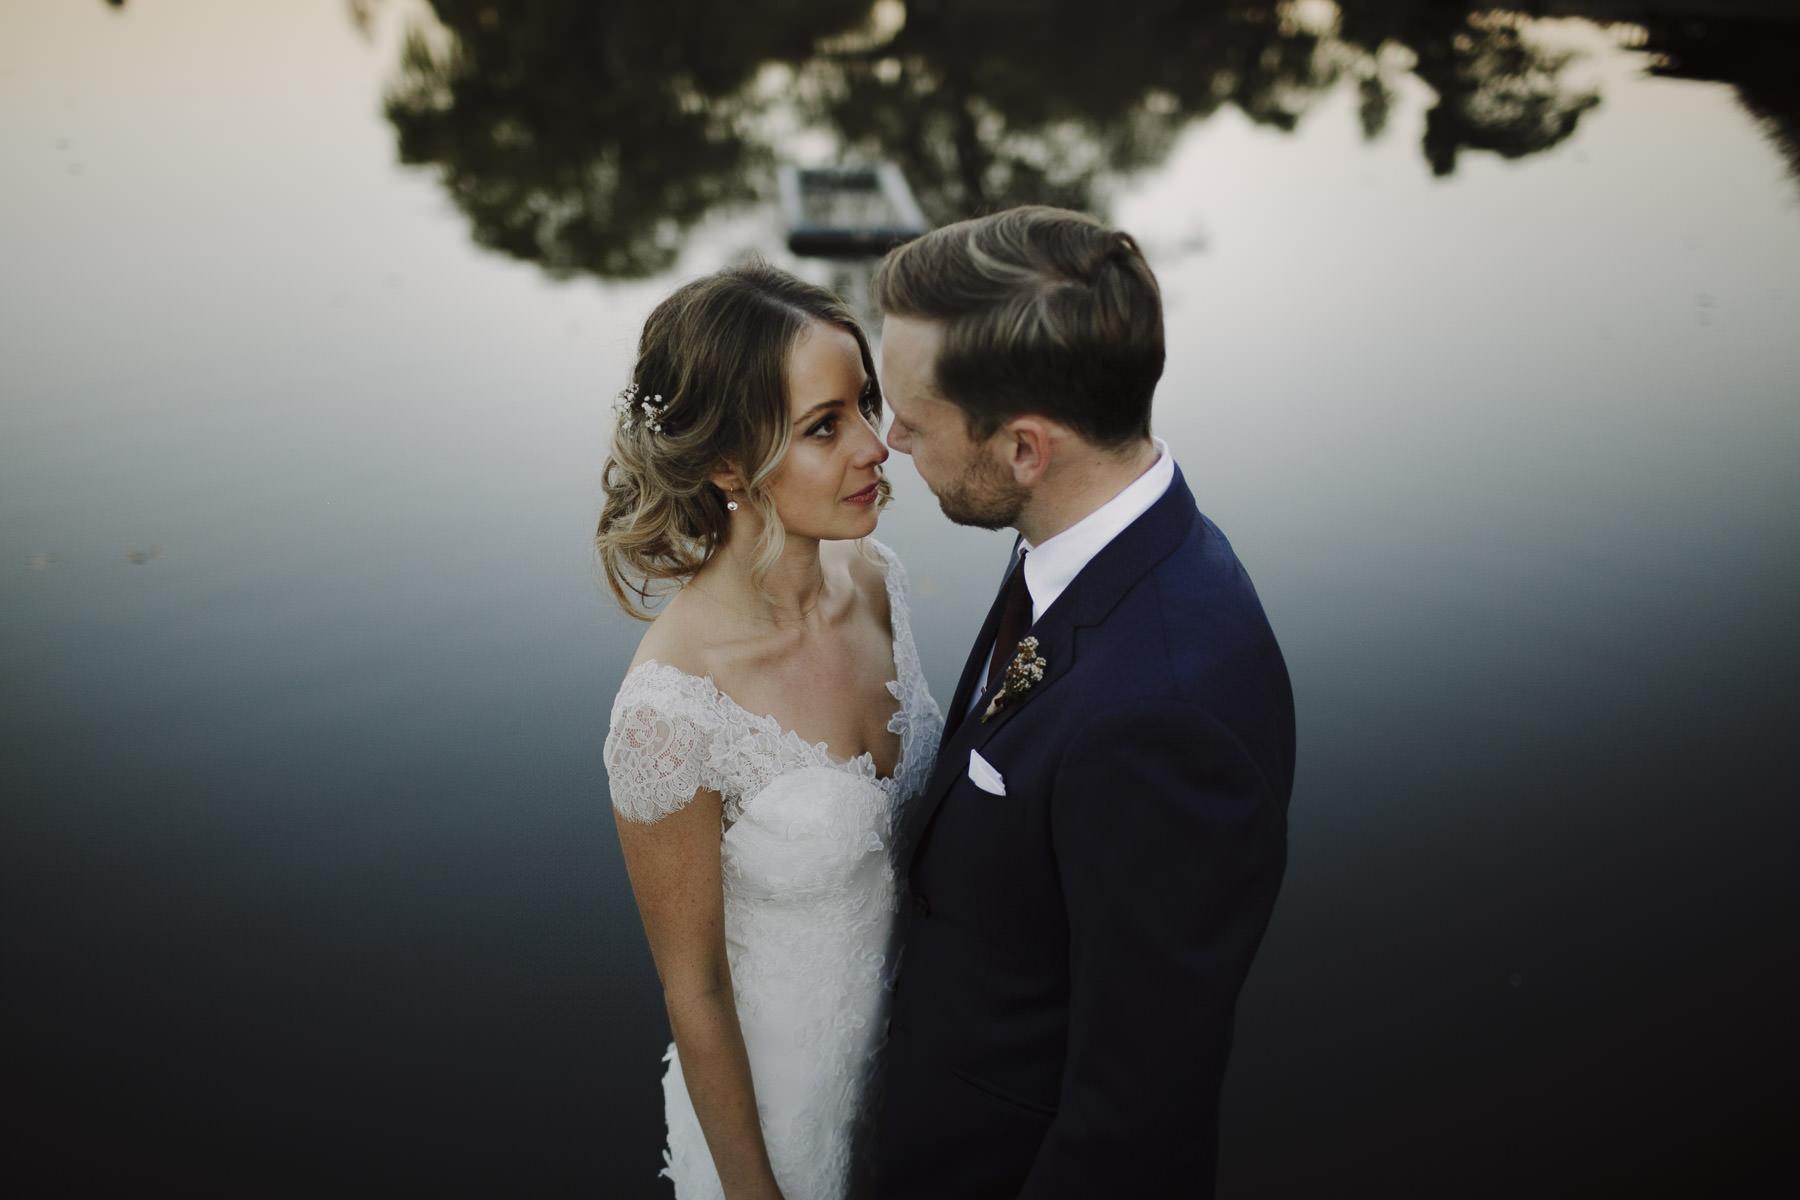 160506_justinaaron_wedding_holly_daniel_pr-203.jpg